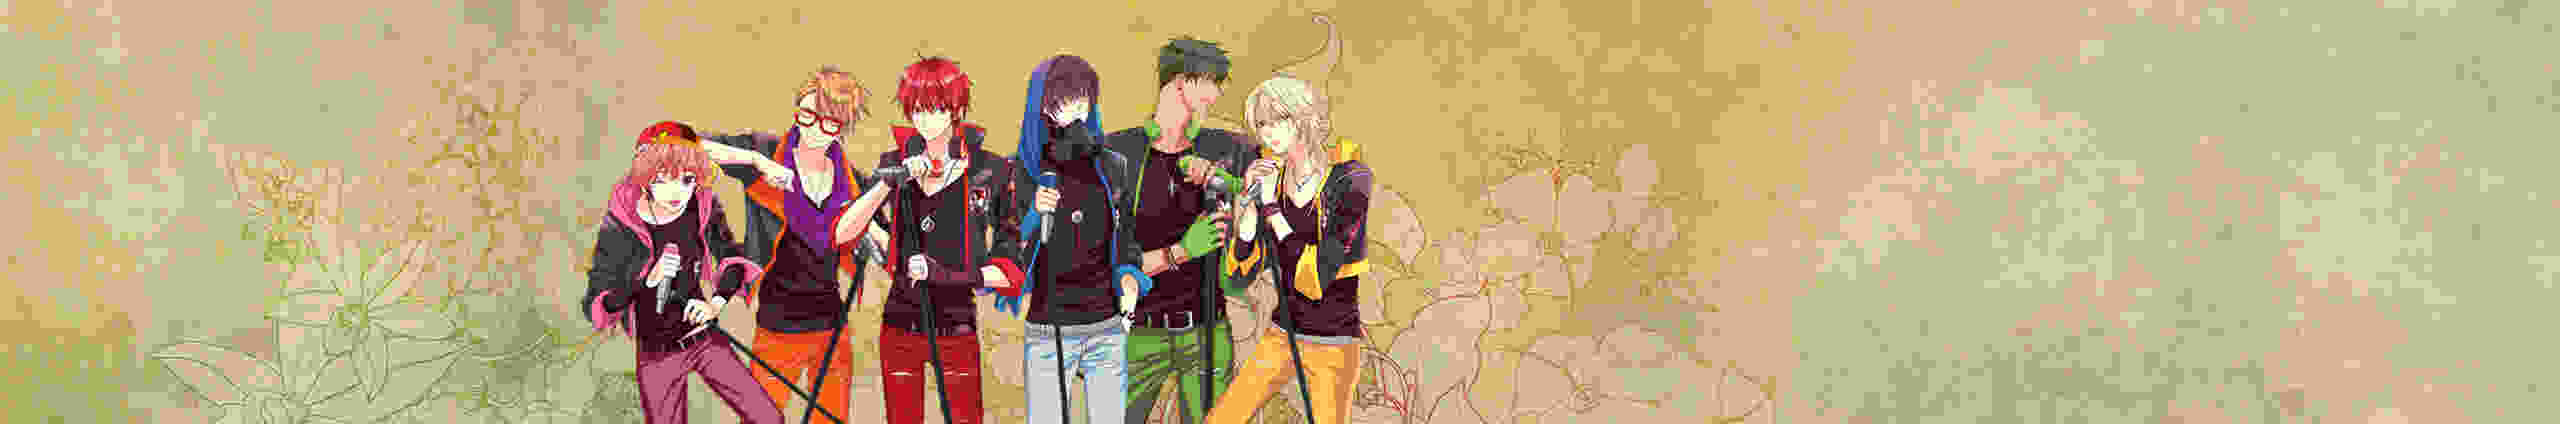 Flower Boy, ฮวารัง